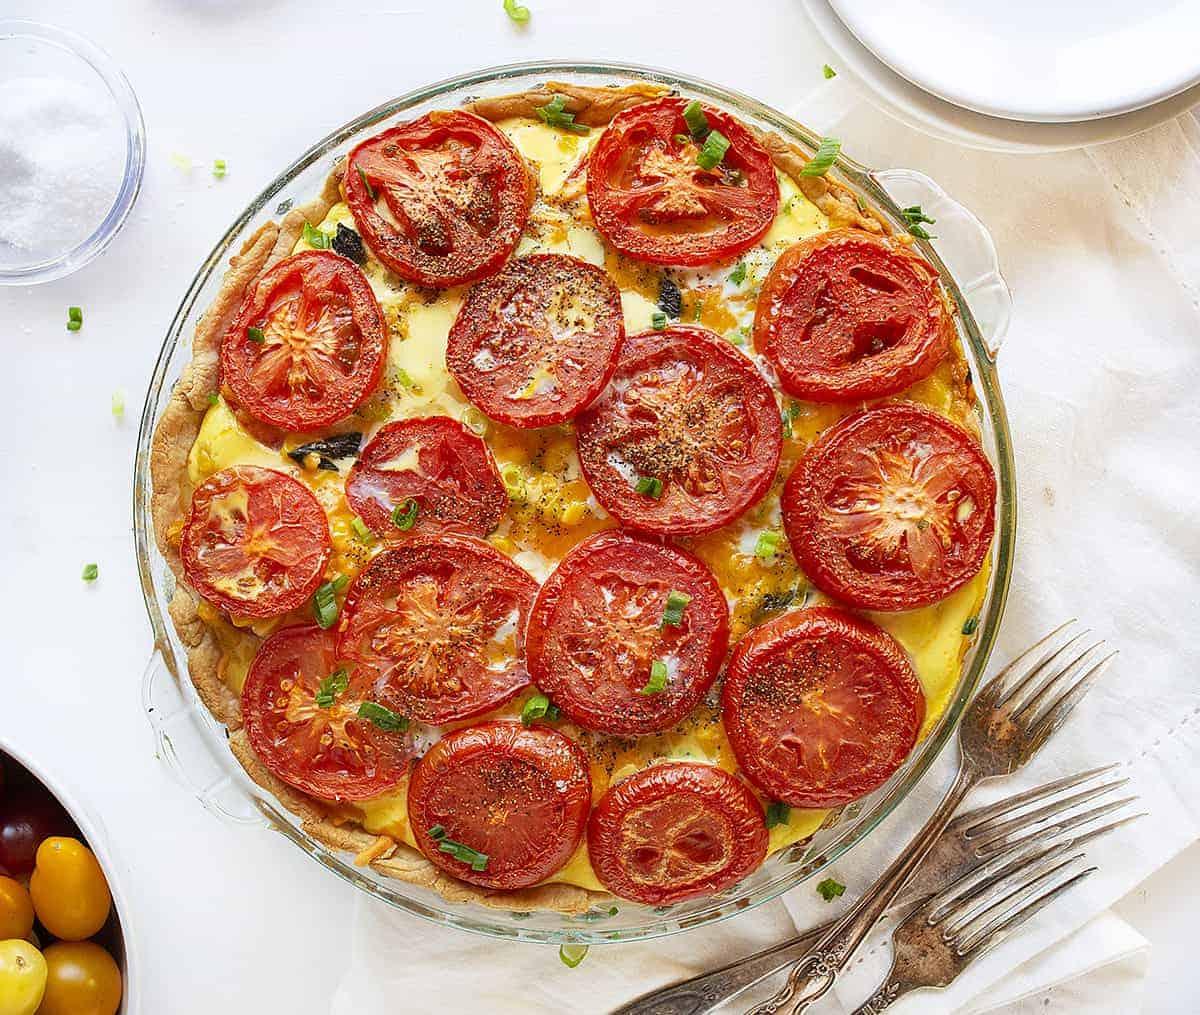 Overhead view of Tomato and Corn Pie